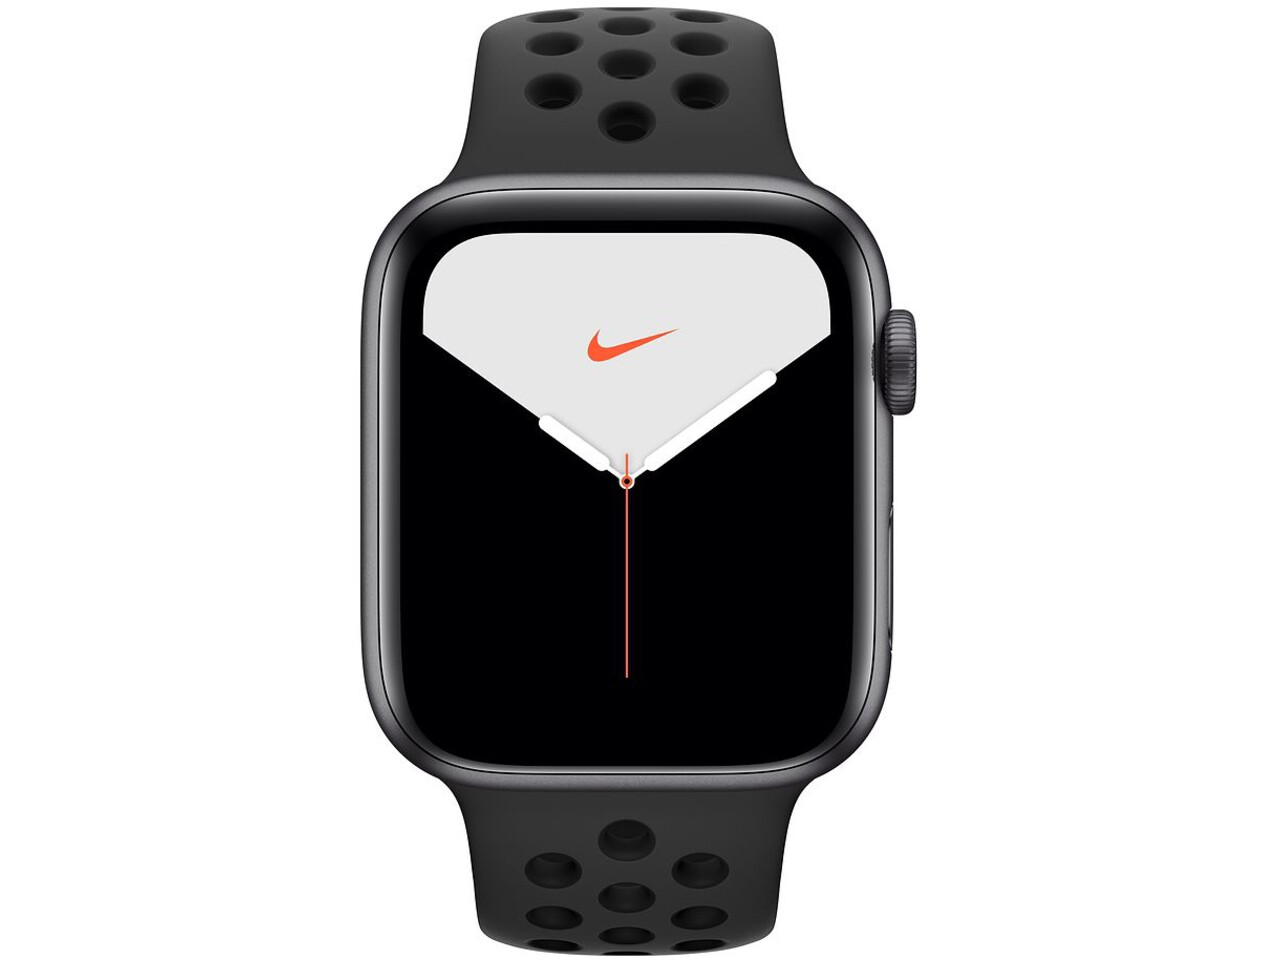 apple watch nike series 5 cellular 44mm space gray aluminum anthraciteblack nike sport band